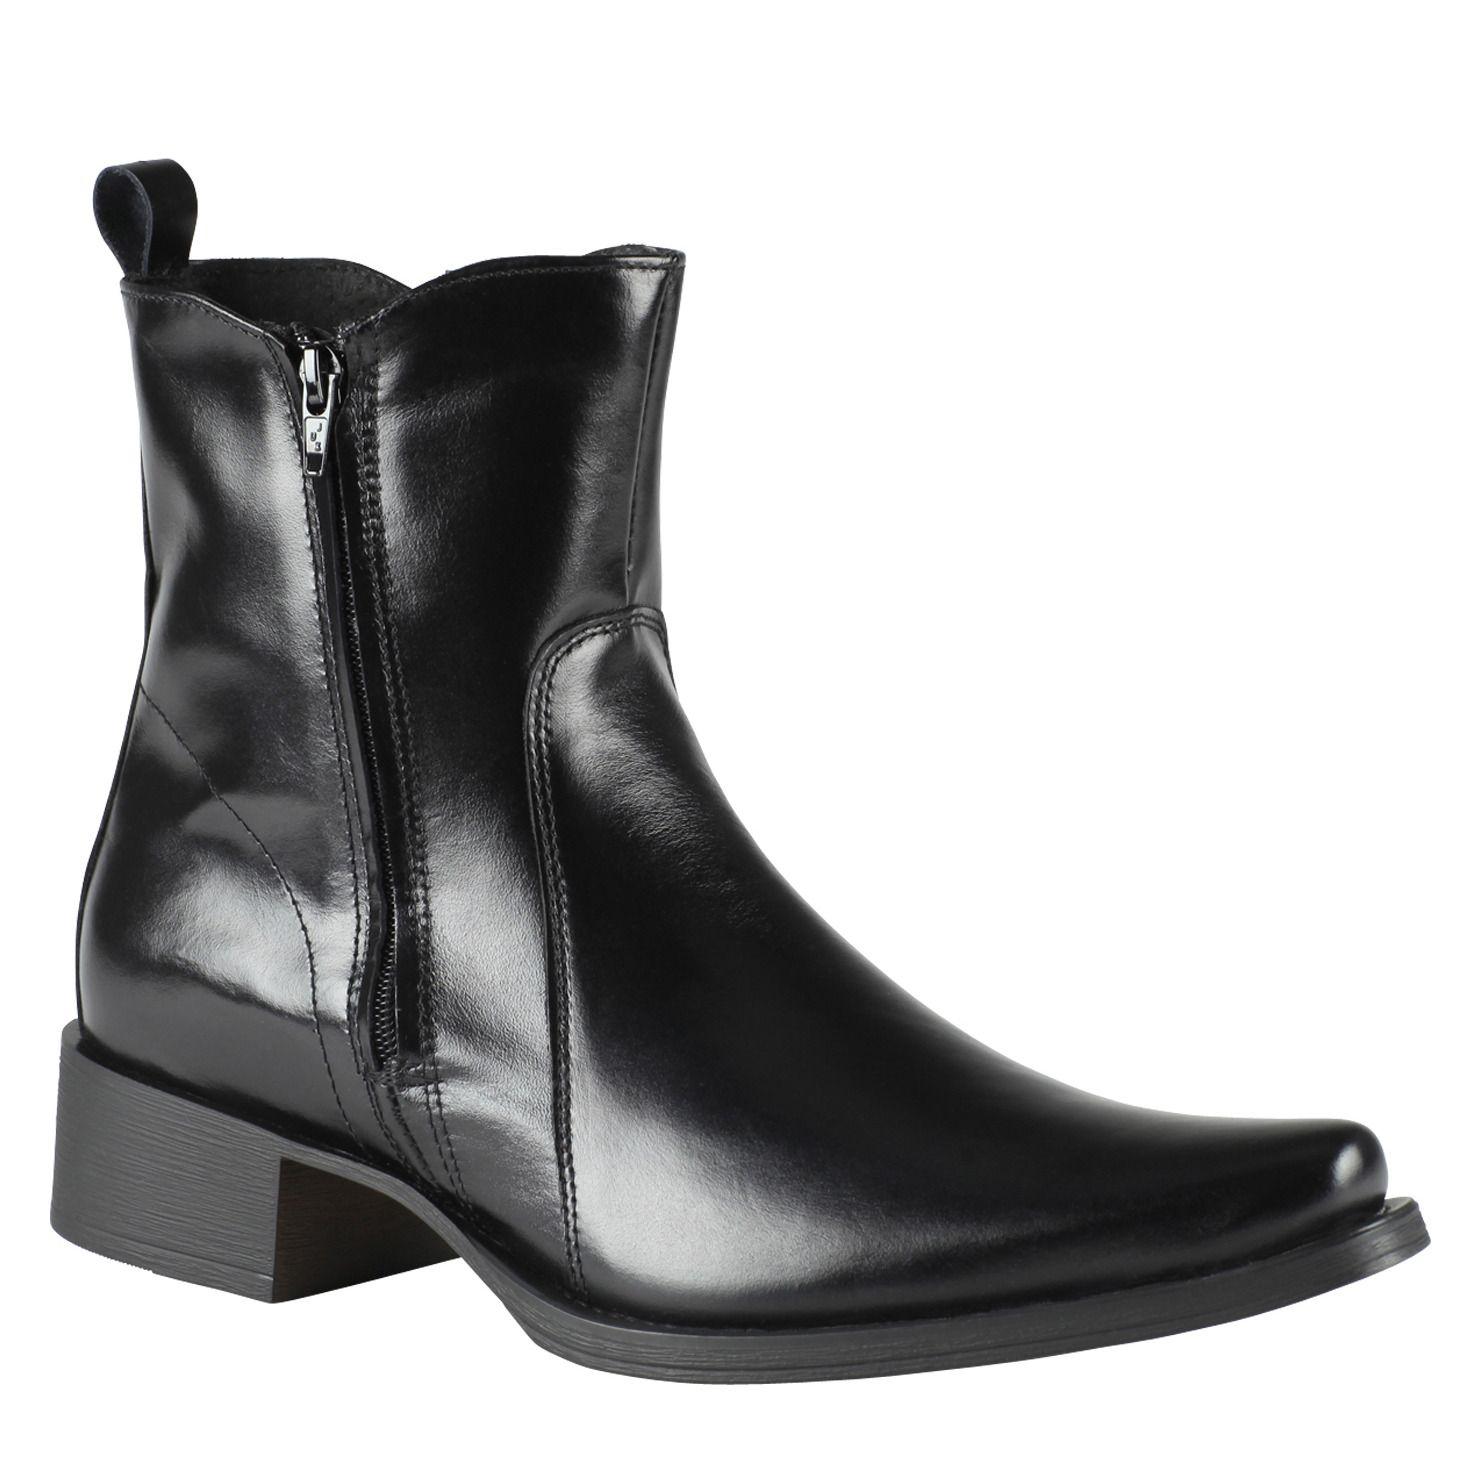 chevi mens dress boots boots for sale at aldo shoes